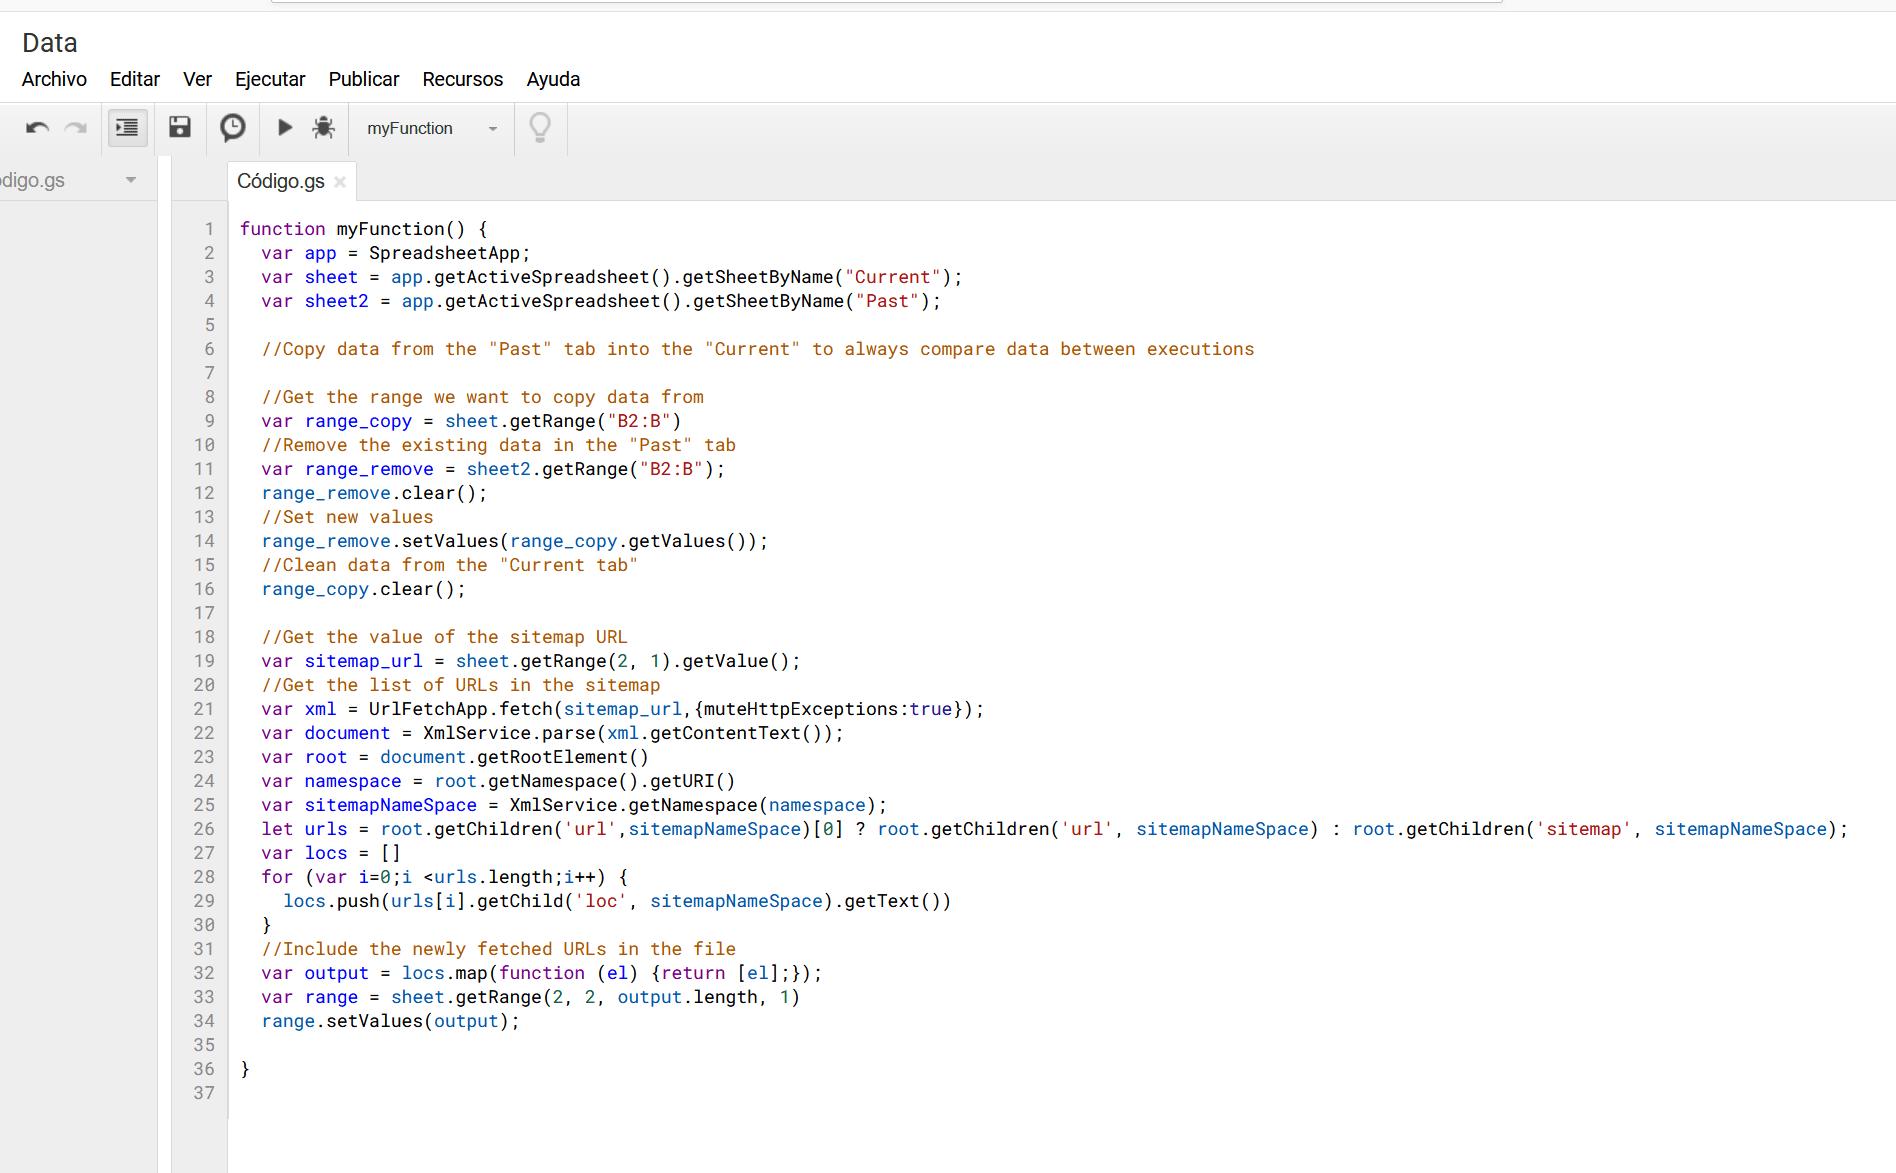 monitorizar sitemaps con integromat - 1